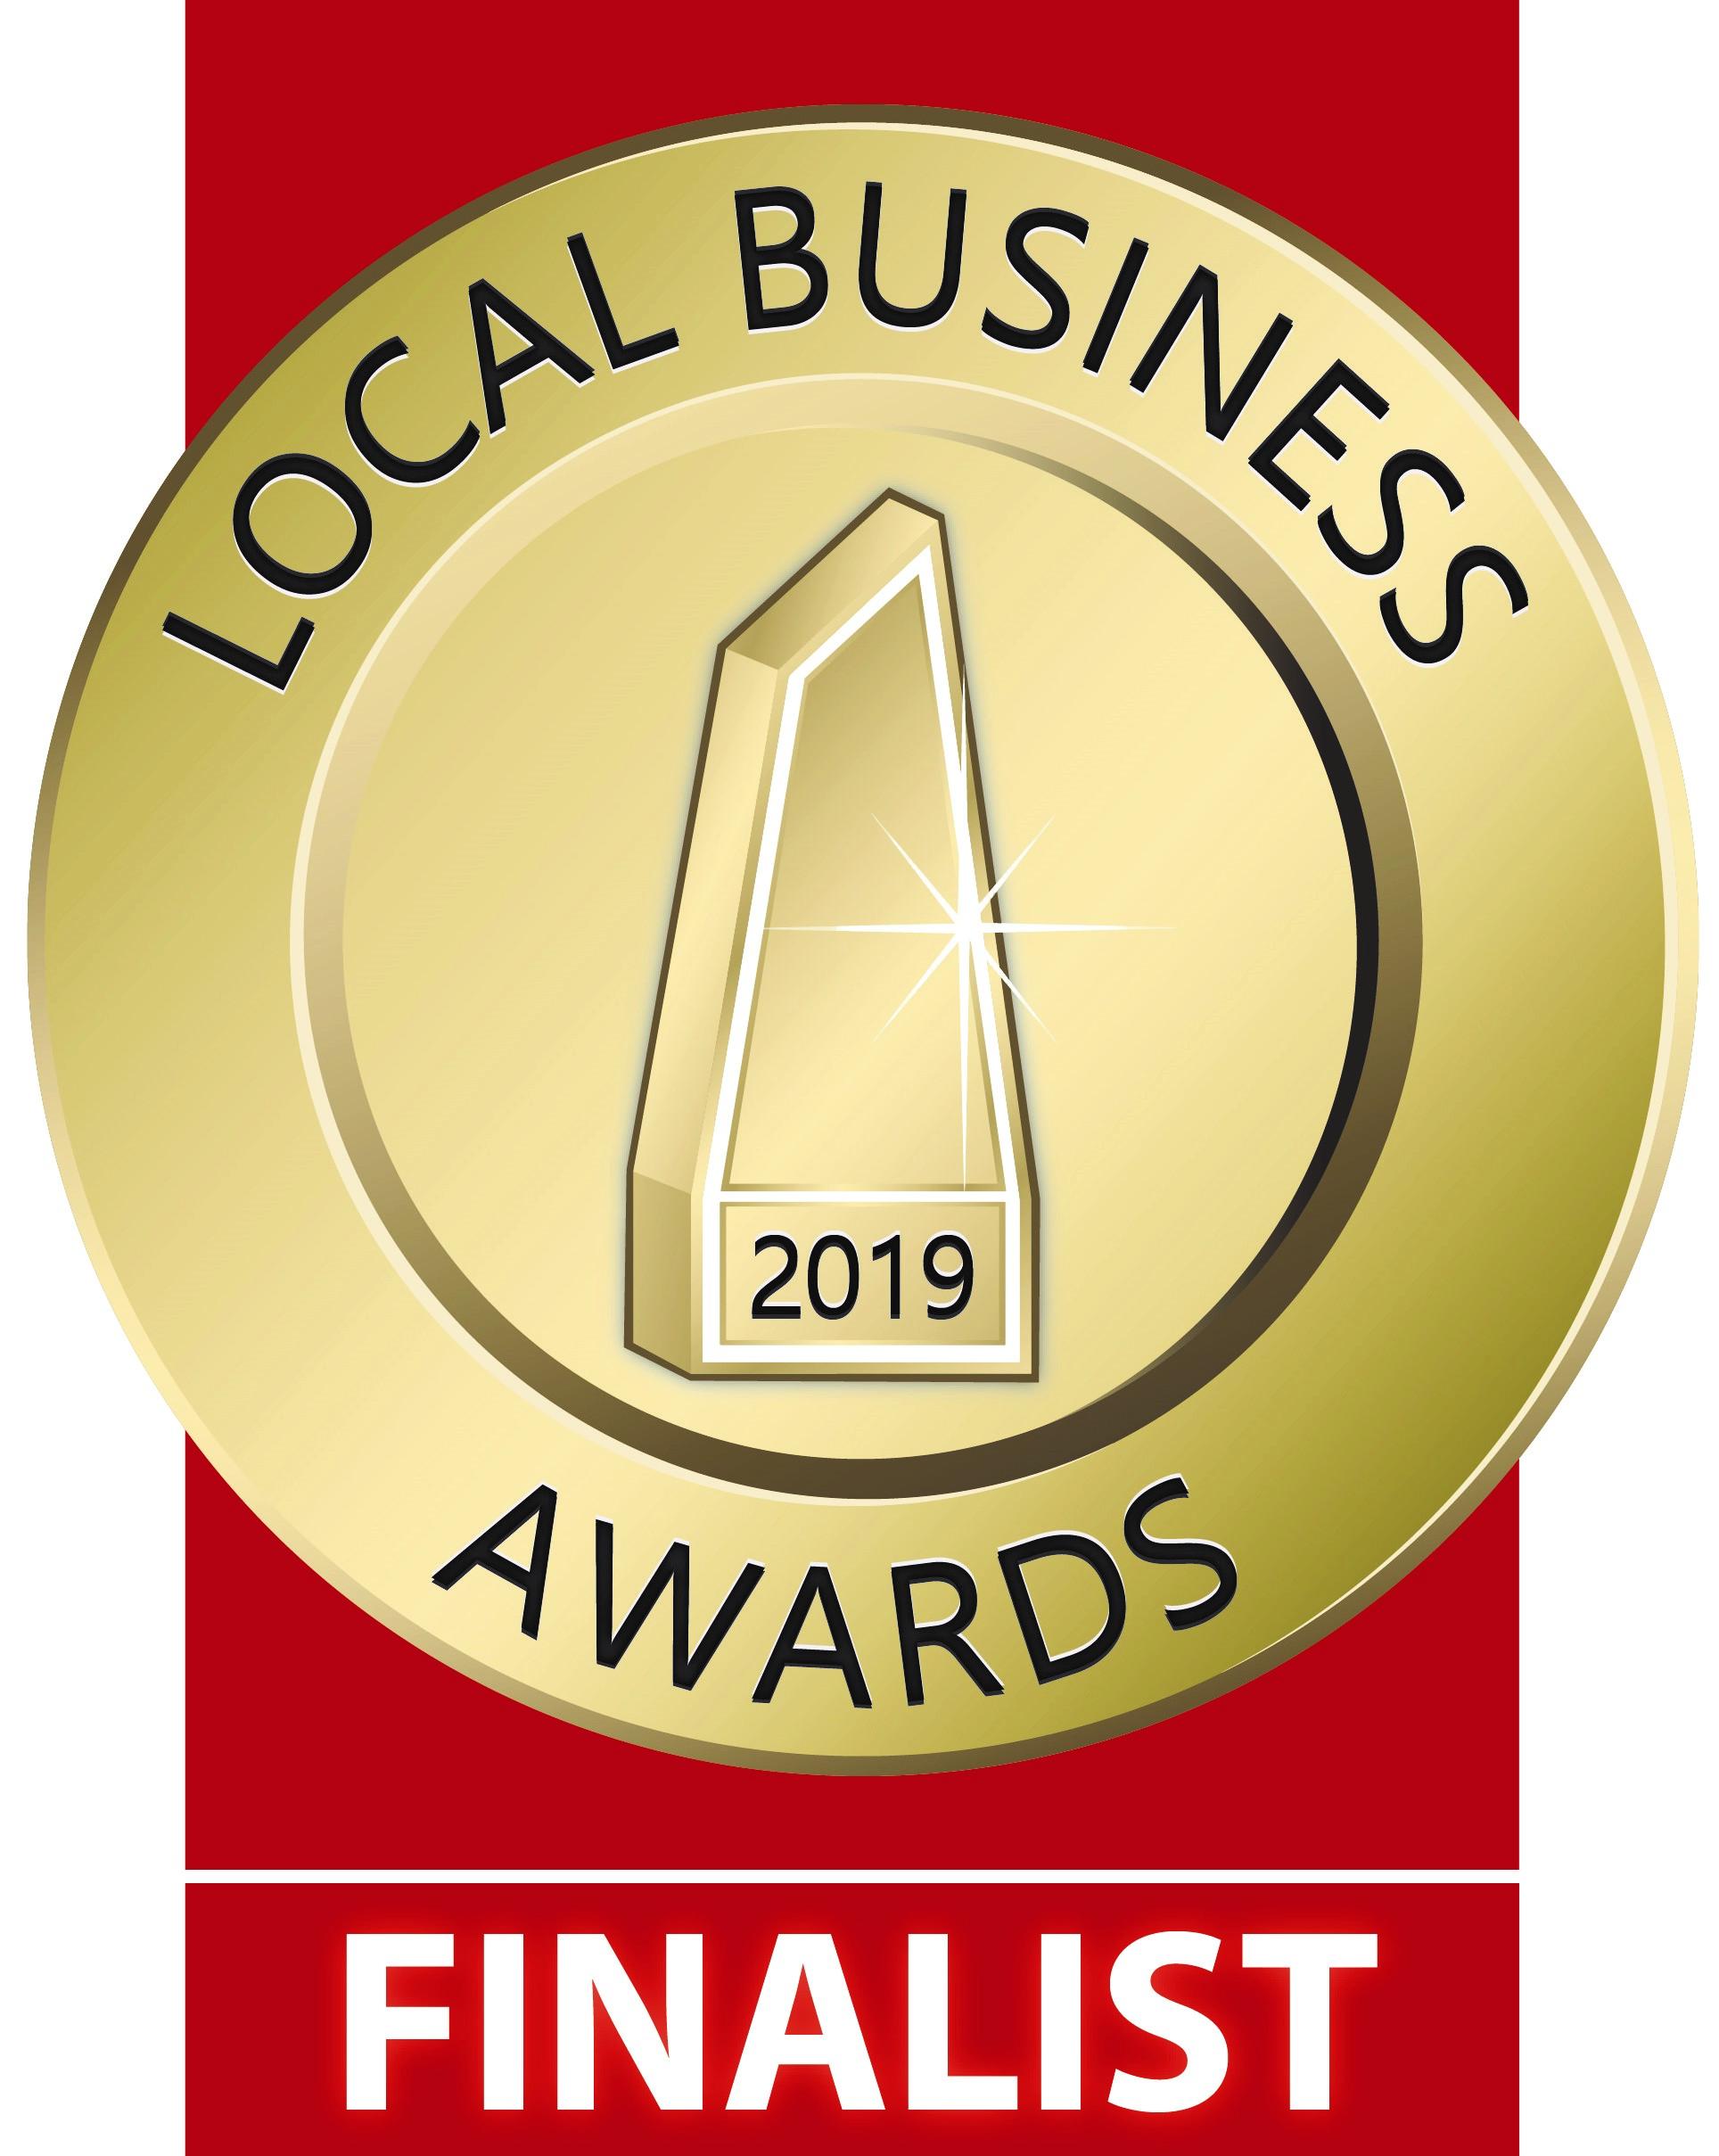 Hills-local-Business-awards-finalists-2019.jpg